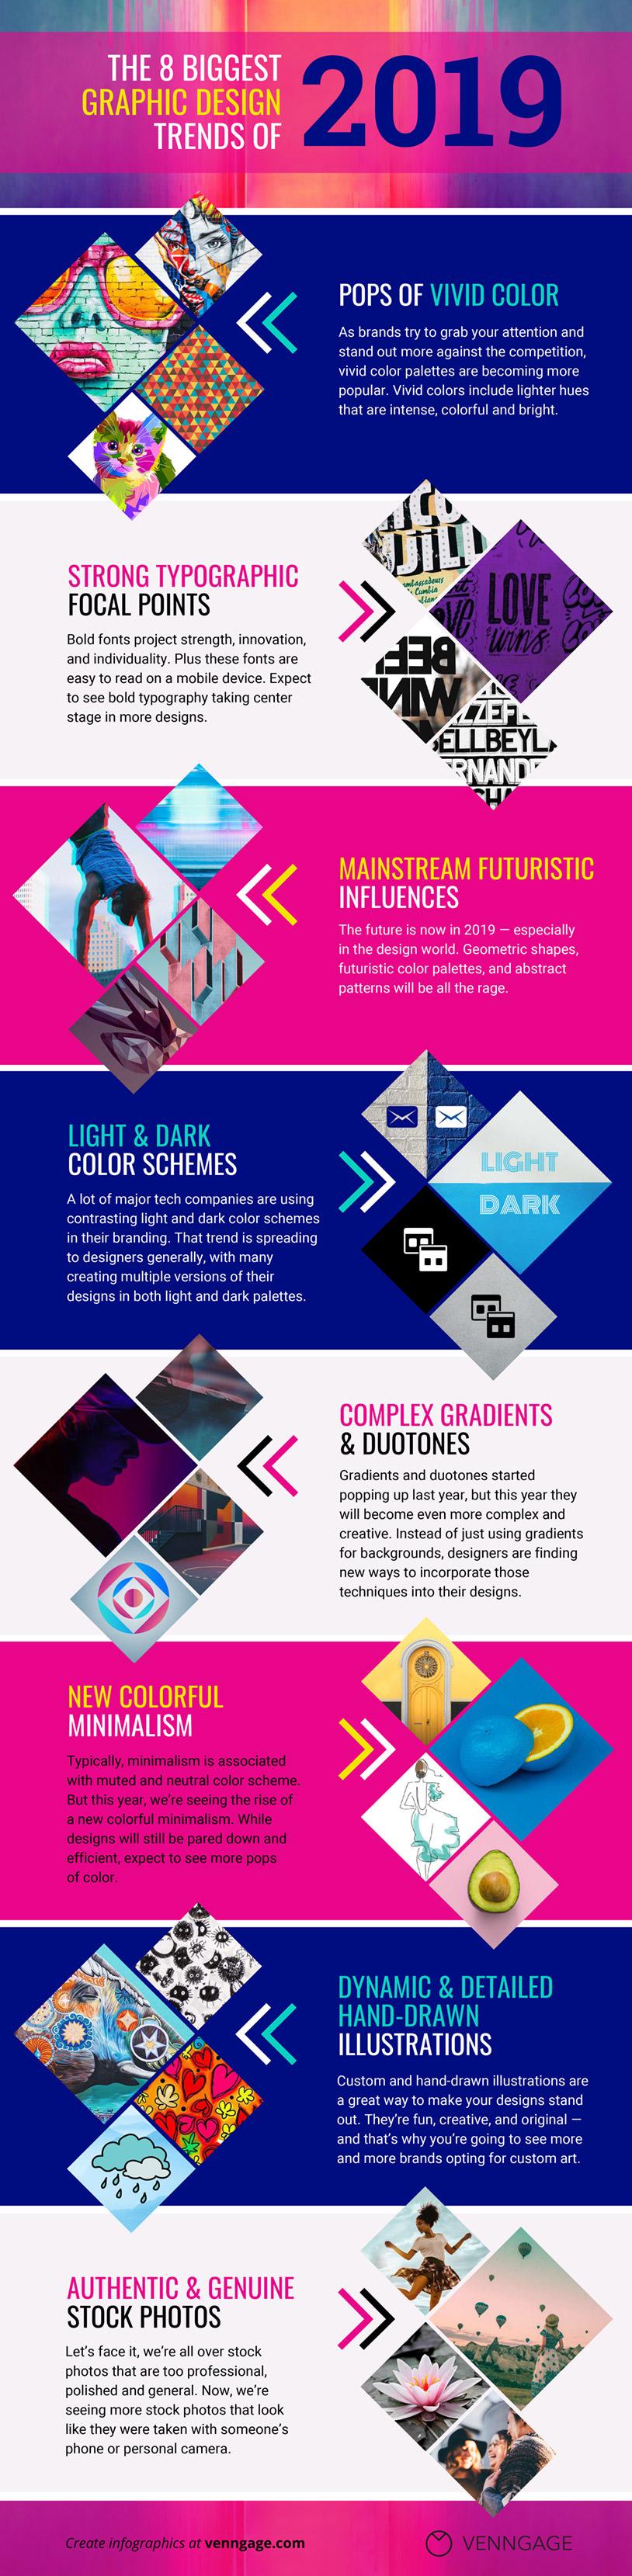 graphic_design_trends_2019_info.jpg